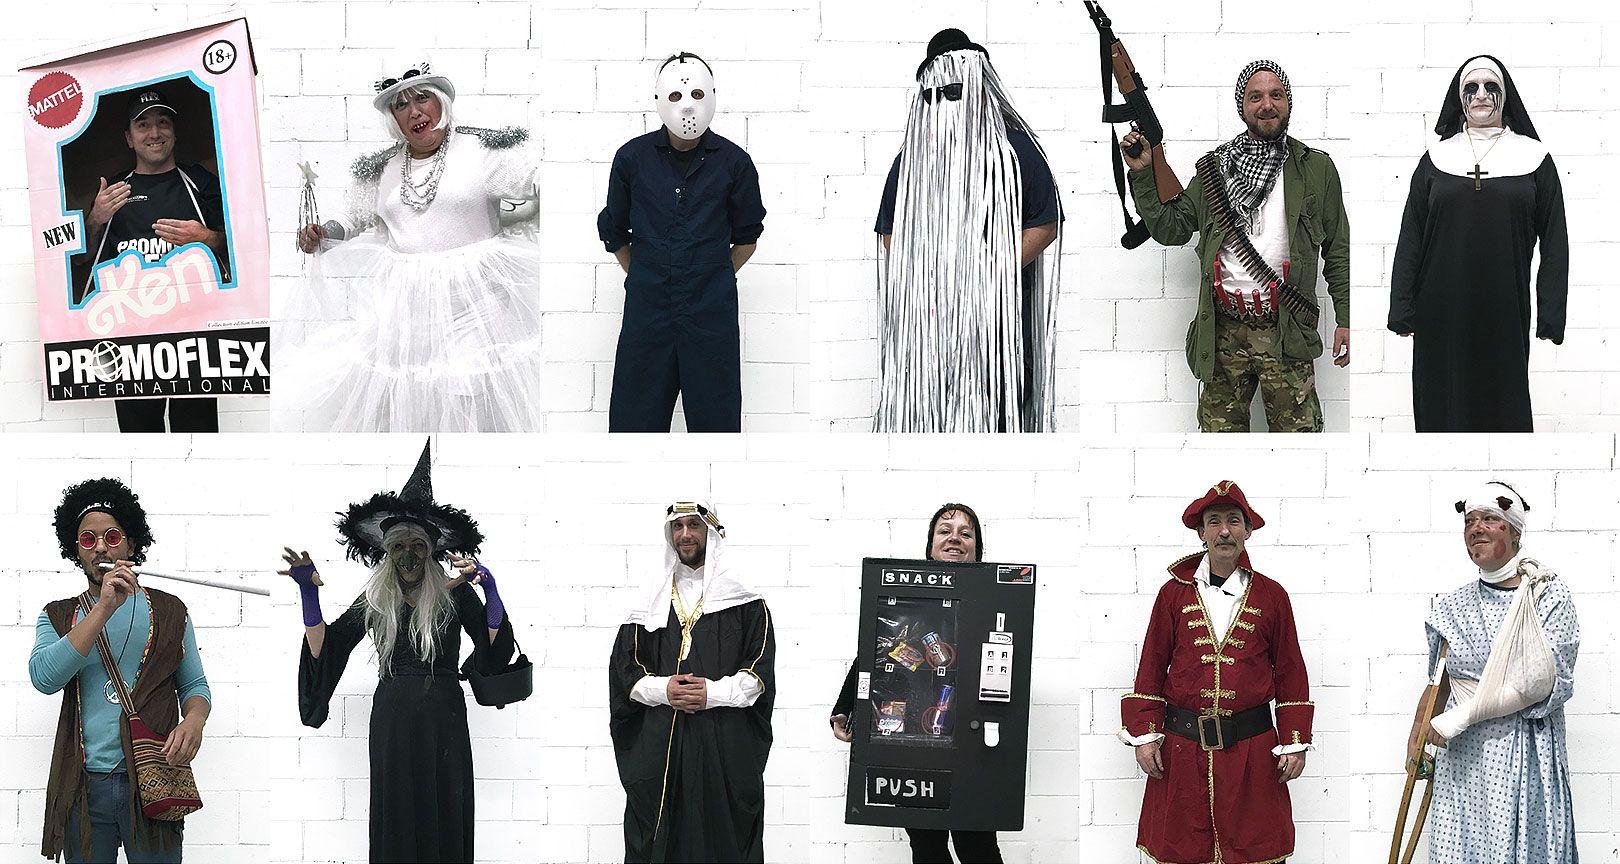 Concours de costumes d'Halloween